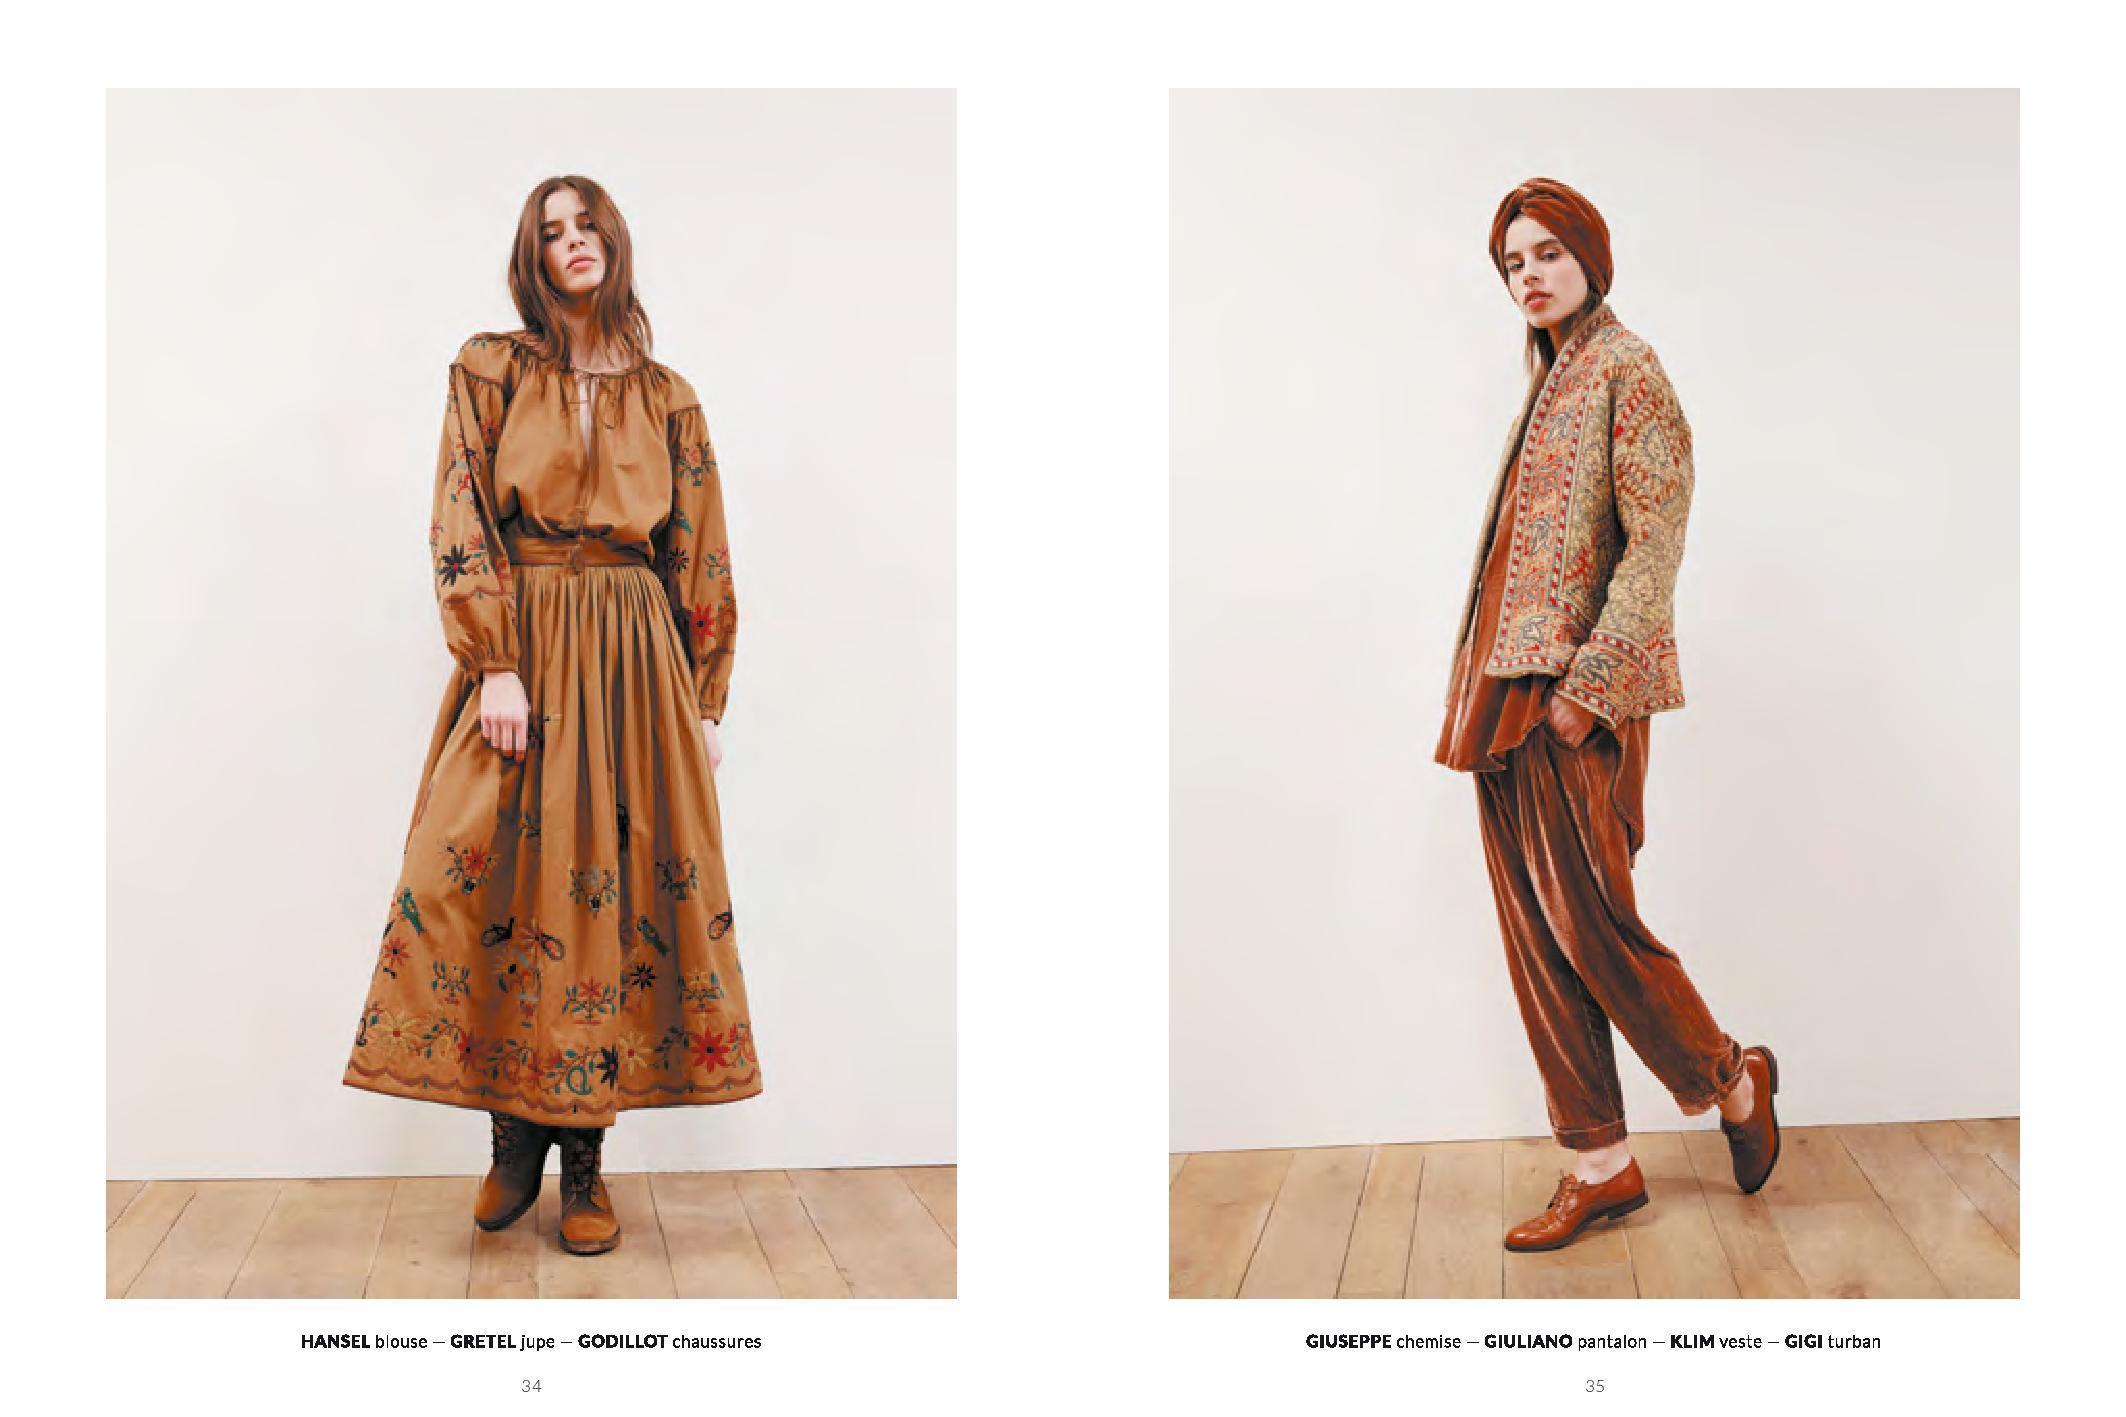 bb_md_lookbook_mes_demoiselles_paris_web_dresscode-page-020.jpg